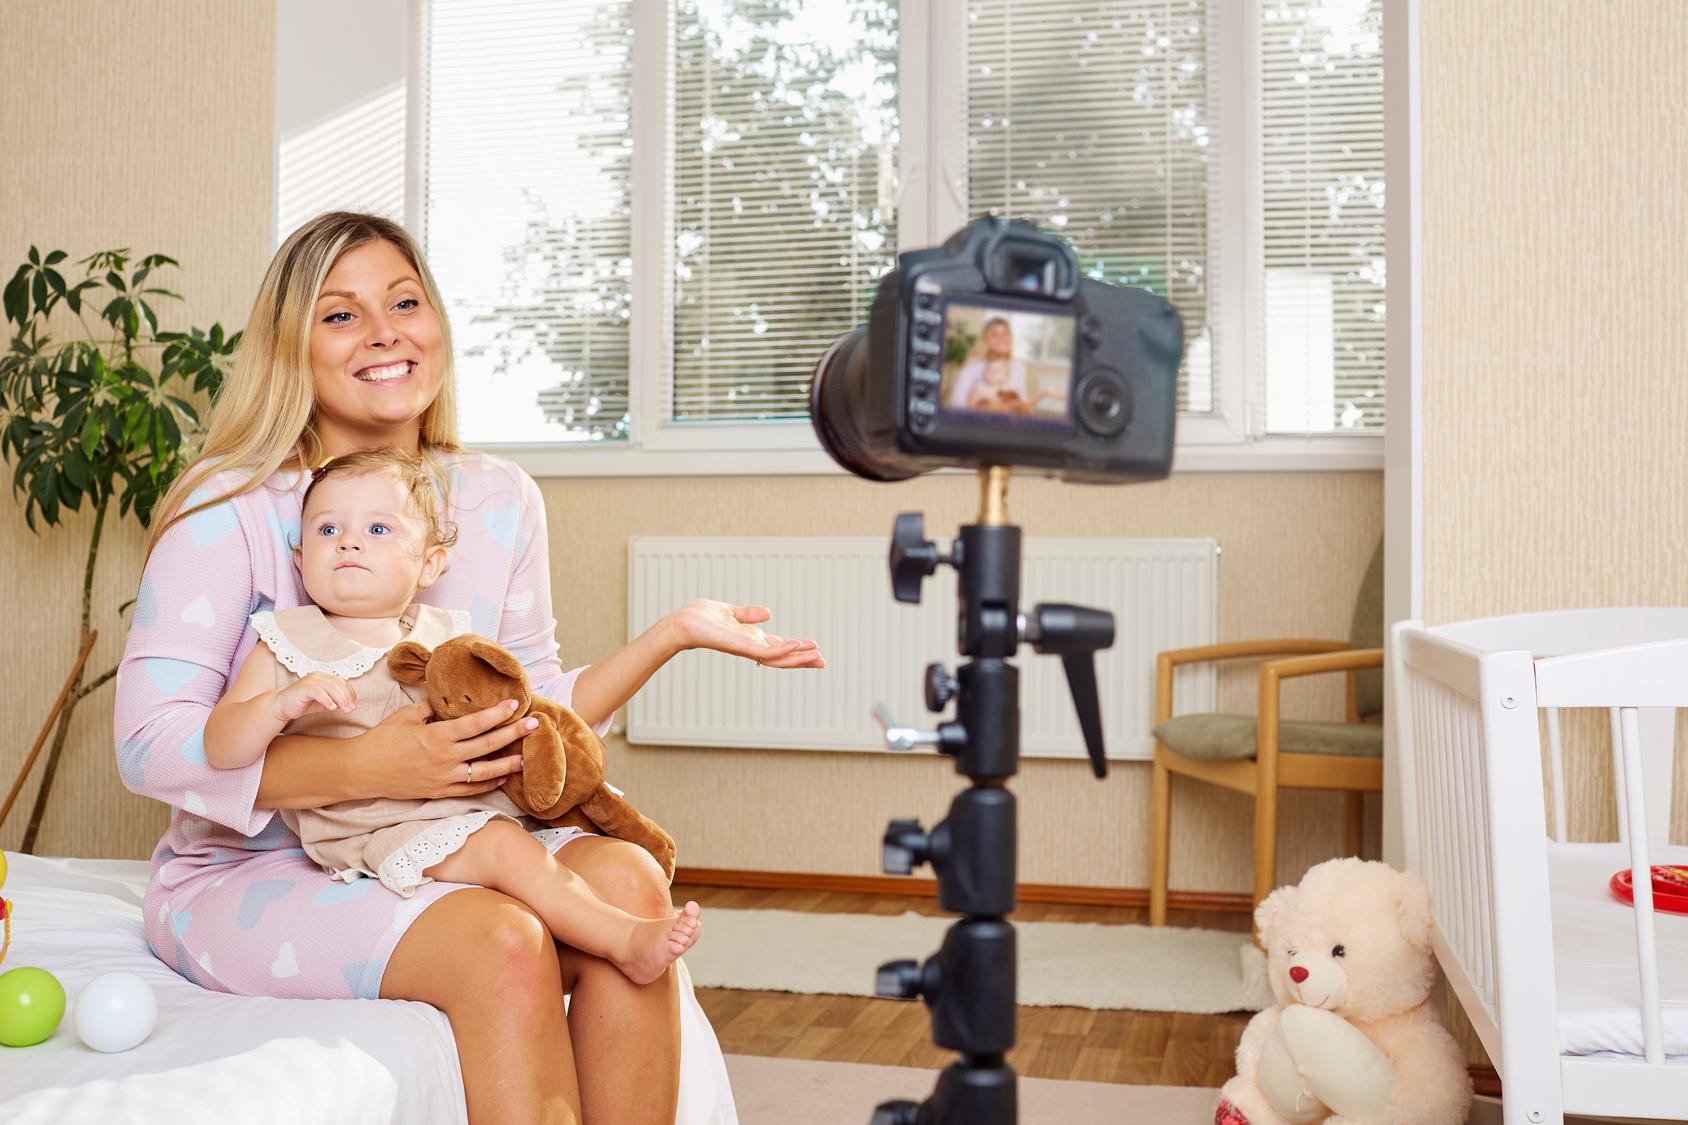 The Best Mom Blog Ideas for Millennial Parents - OnBlastBlog